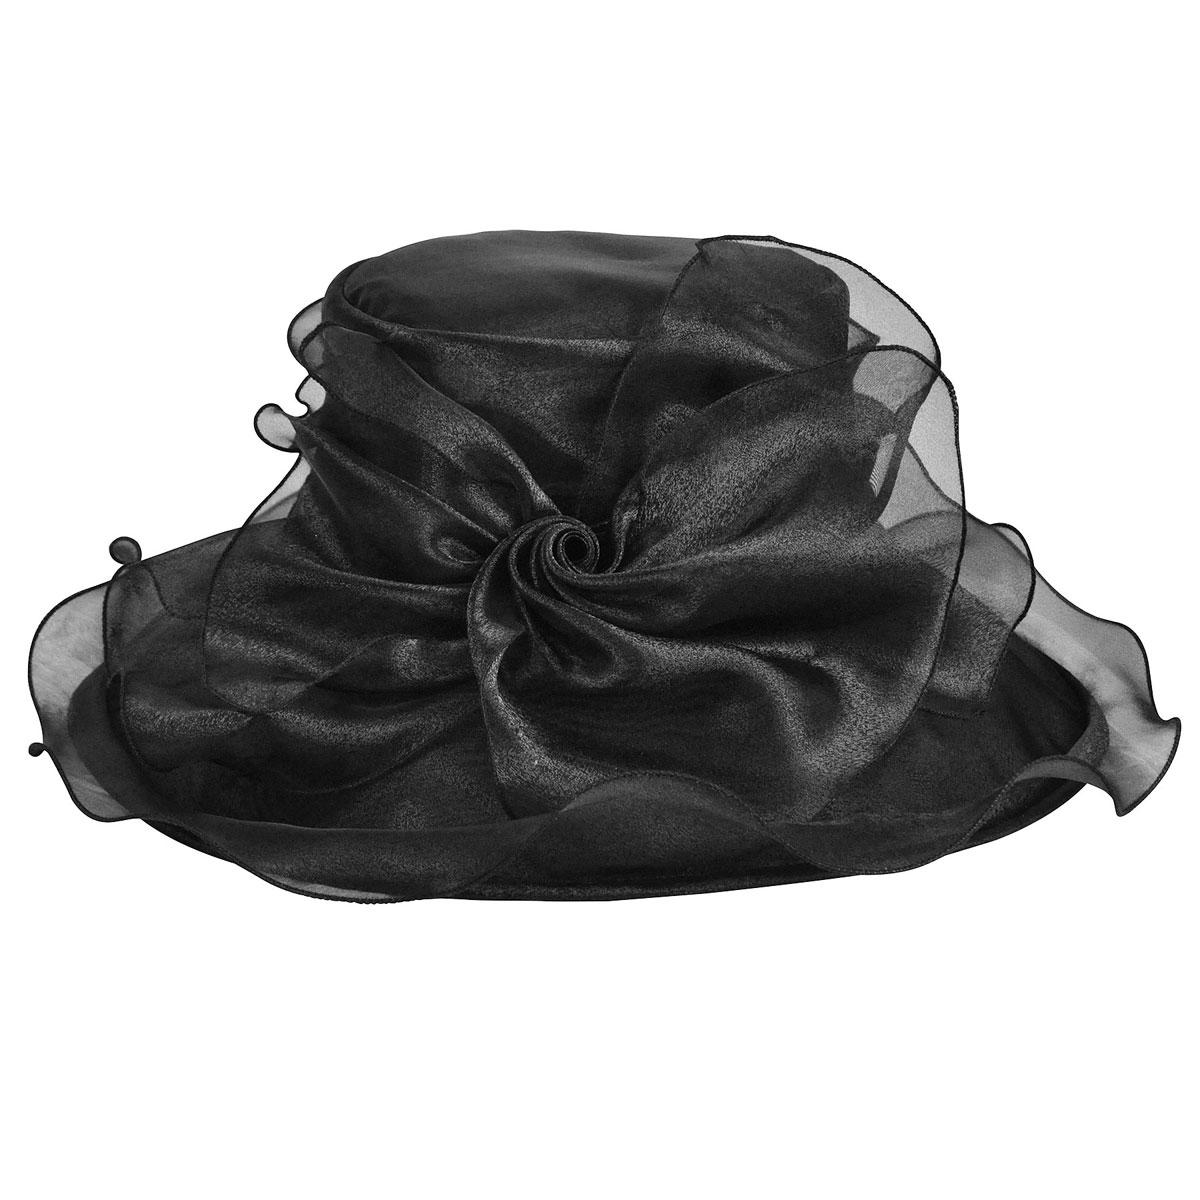 Betmar Mavis Hat in Black